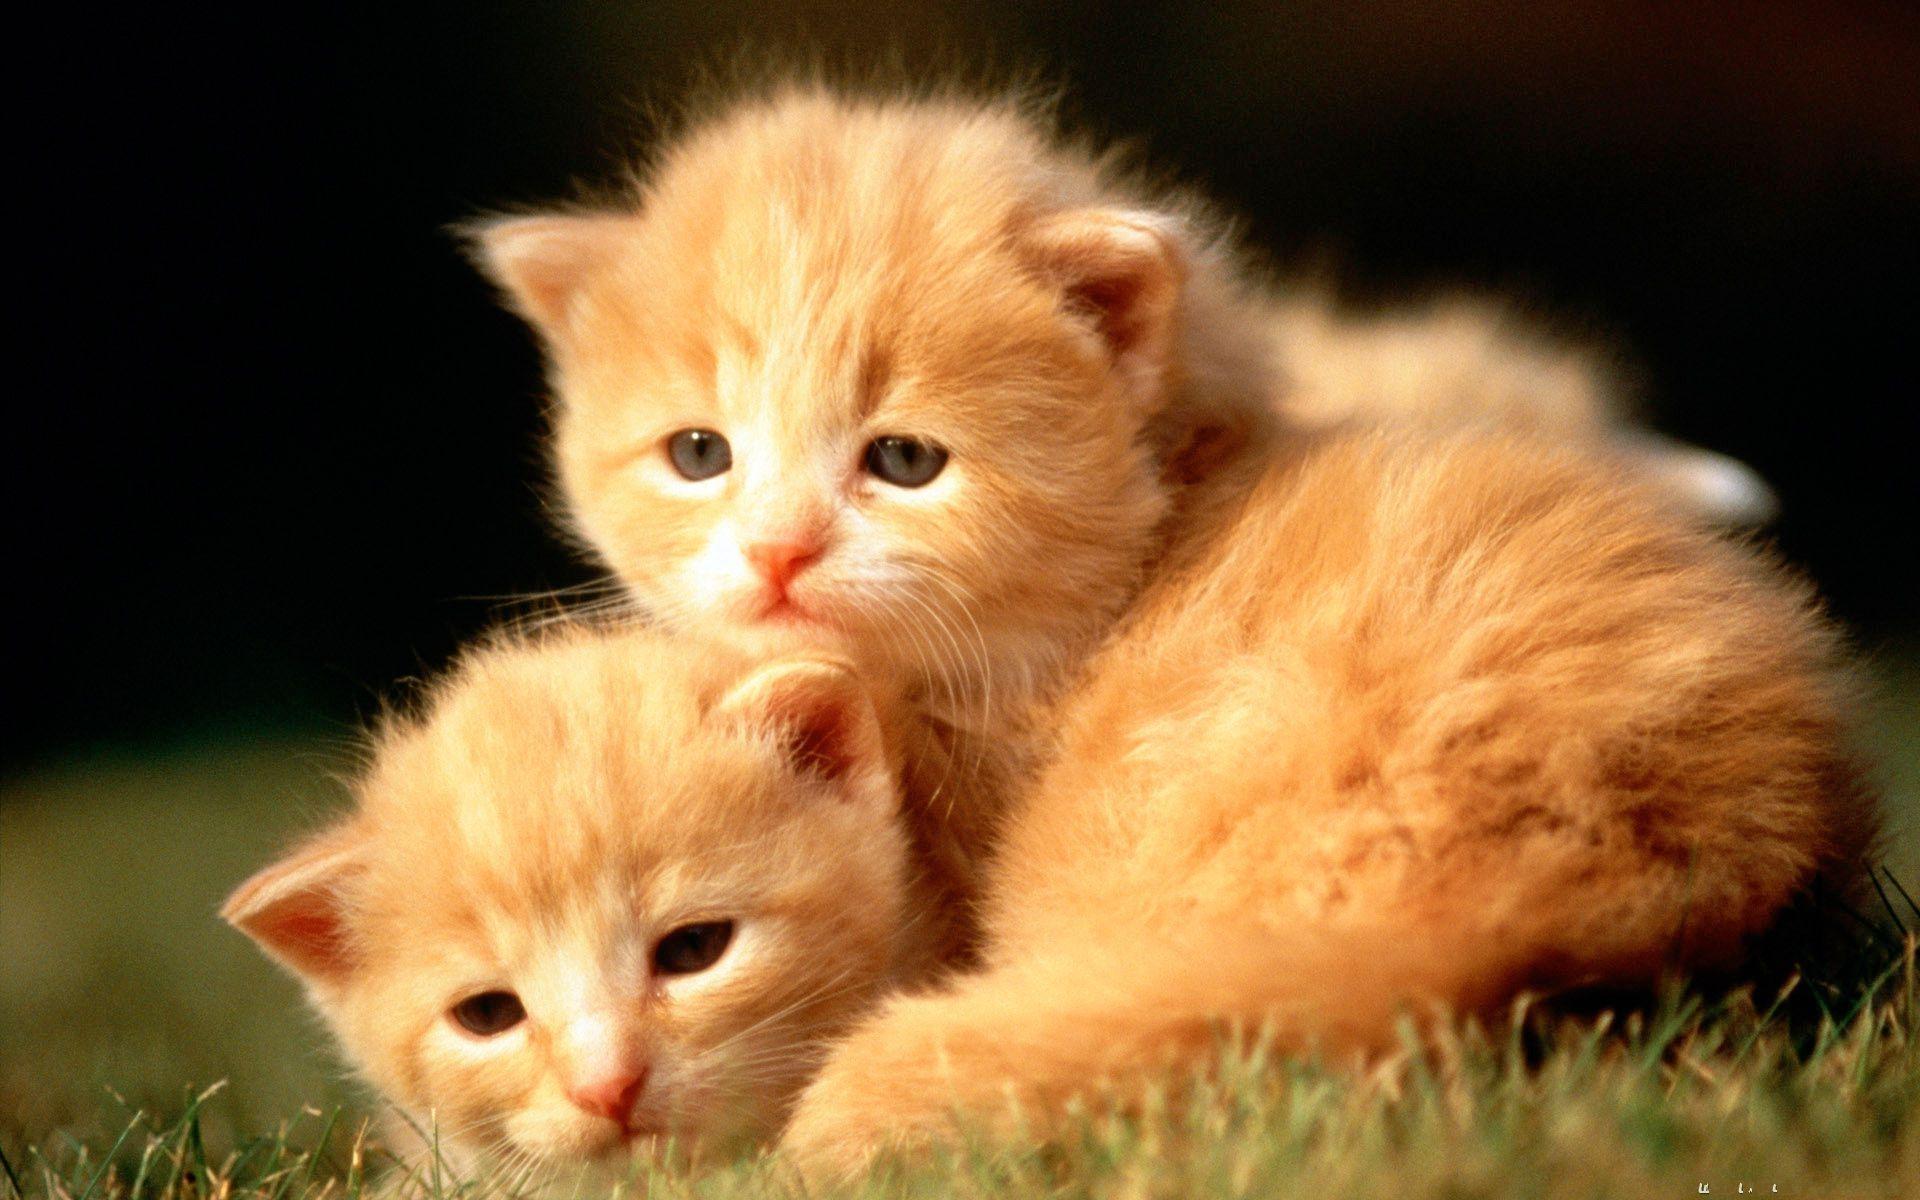 10 Top Cute Wild Animal Wallpaper Full Hd 1080p For Pc: 10 Best Baby Animals Desktop Wallpaper FULL HD 1080p For